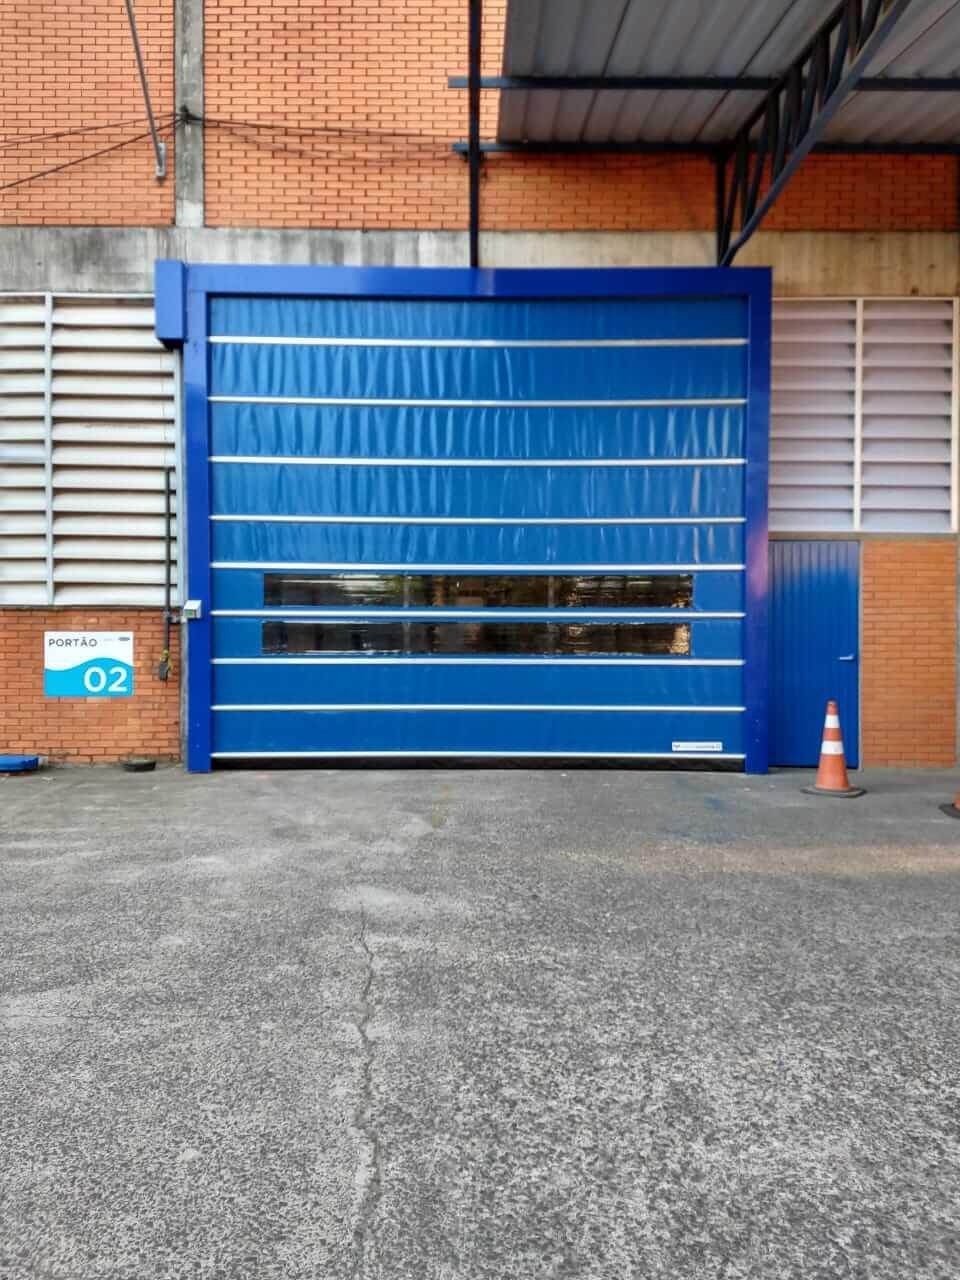 Porta industrial fast casing